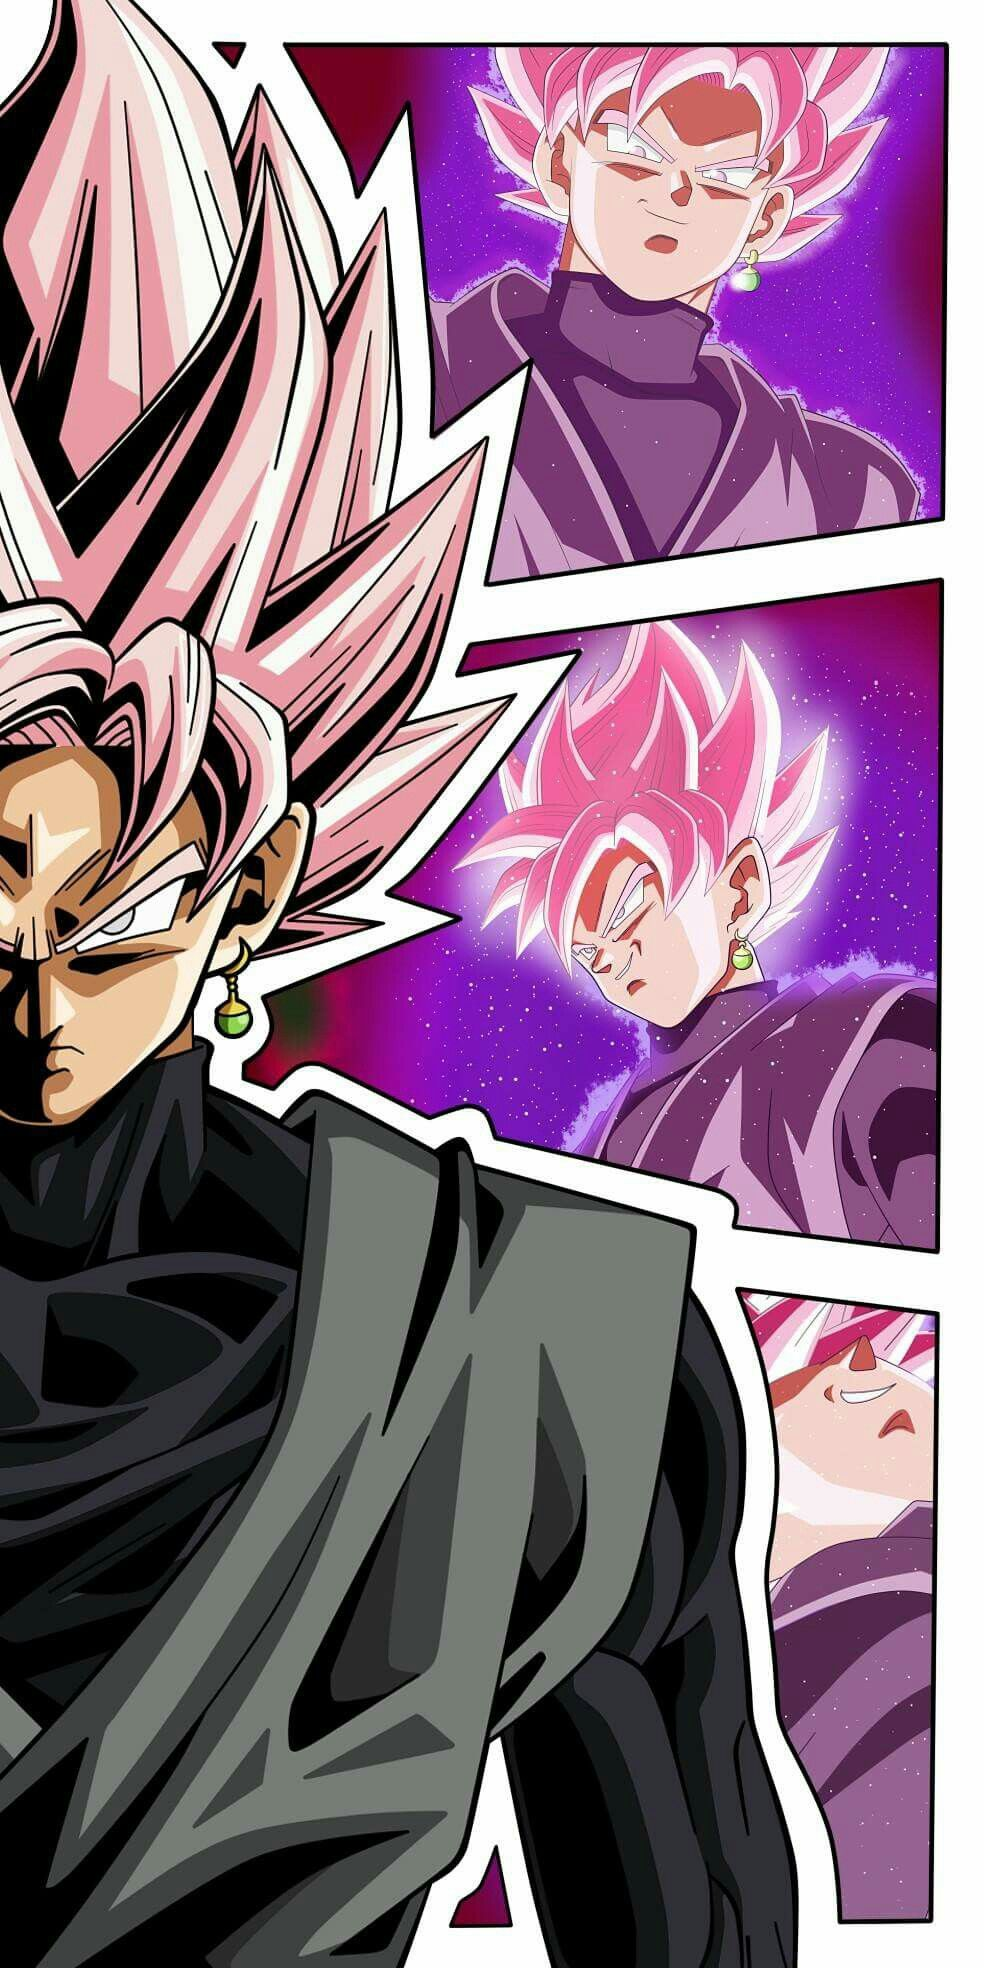 Super Saiyajin Rose Goku Black 超サイヤ人 ロゼ 悟空 ブラック